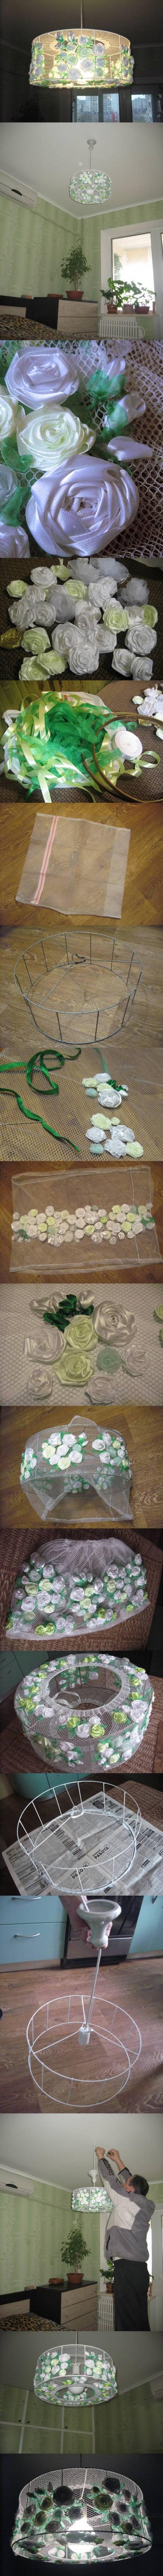 How-to-make-Flower-Chandelier-diy homemade Chandelier-